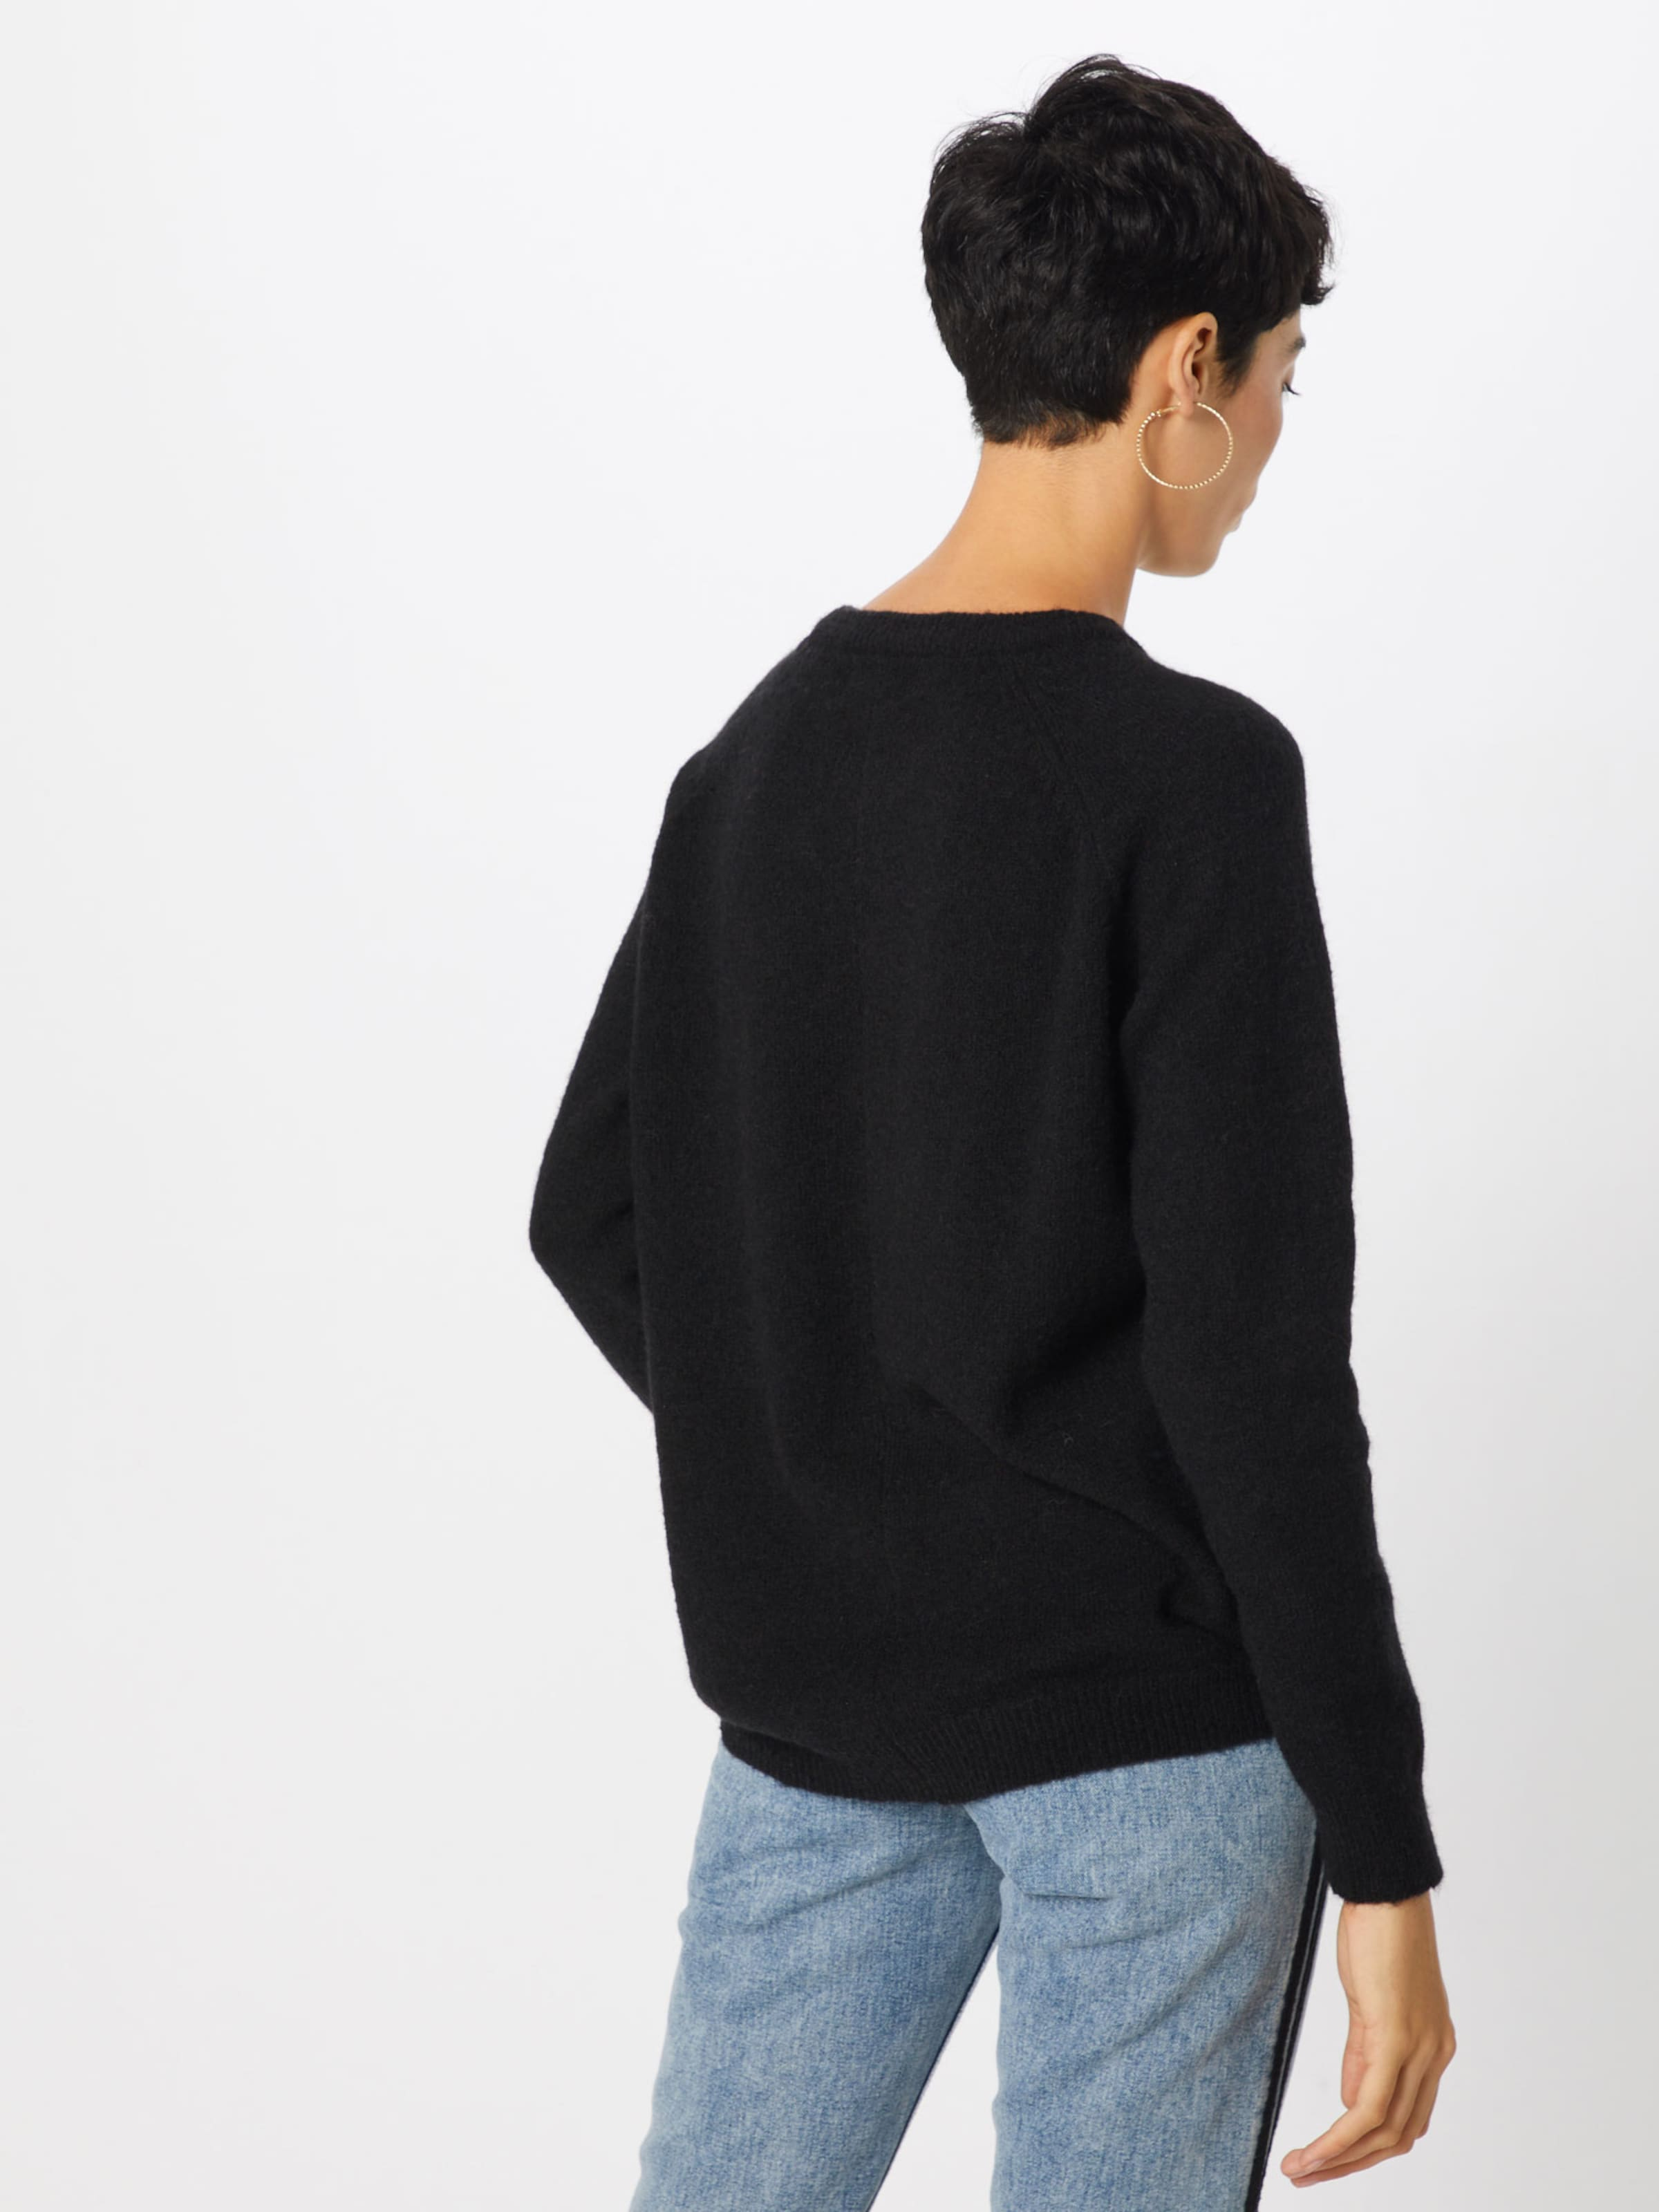 Minimum Minimum 'kita' 'kita' 'kita' Schwarz Pullover Pullover Minimum In In Schwarz Pullover 53RAjqL4